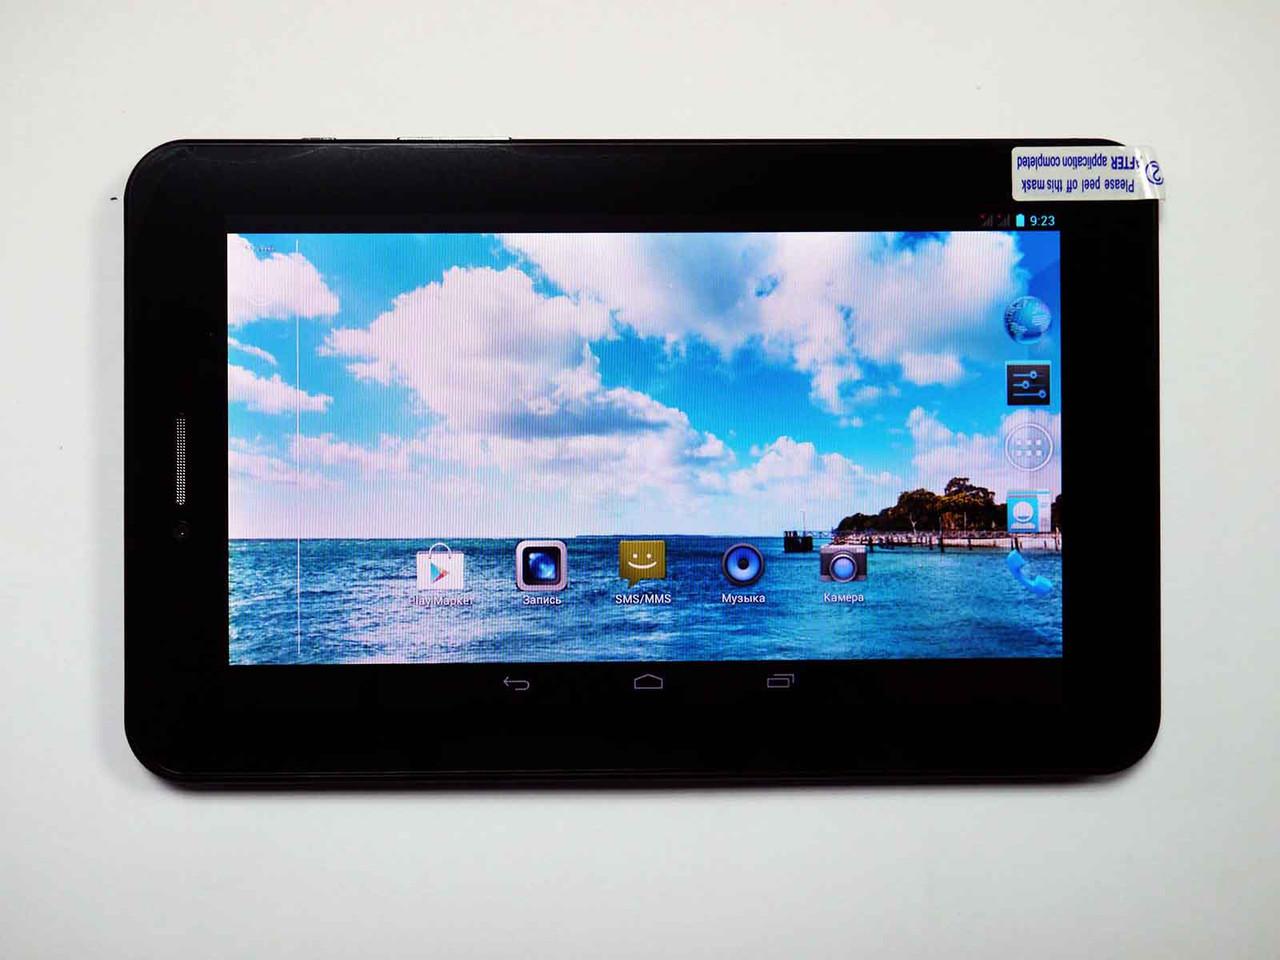 Freelander Z10 Планшет GPS навигатор + IPS + 2Ядра + 2Sim/3G BT + Автокомплект